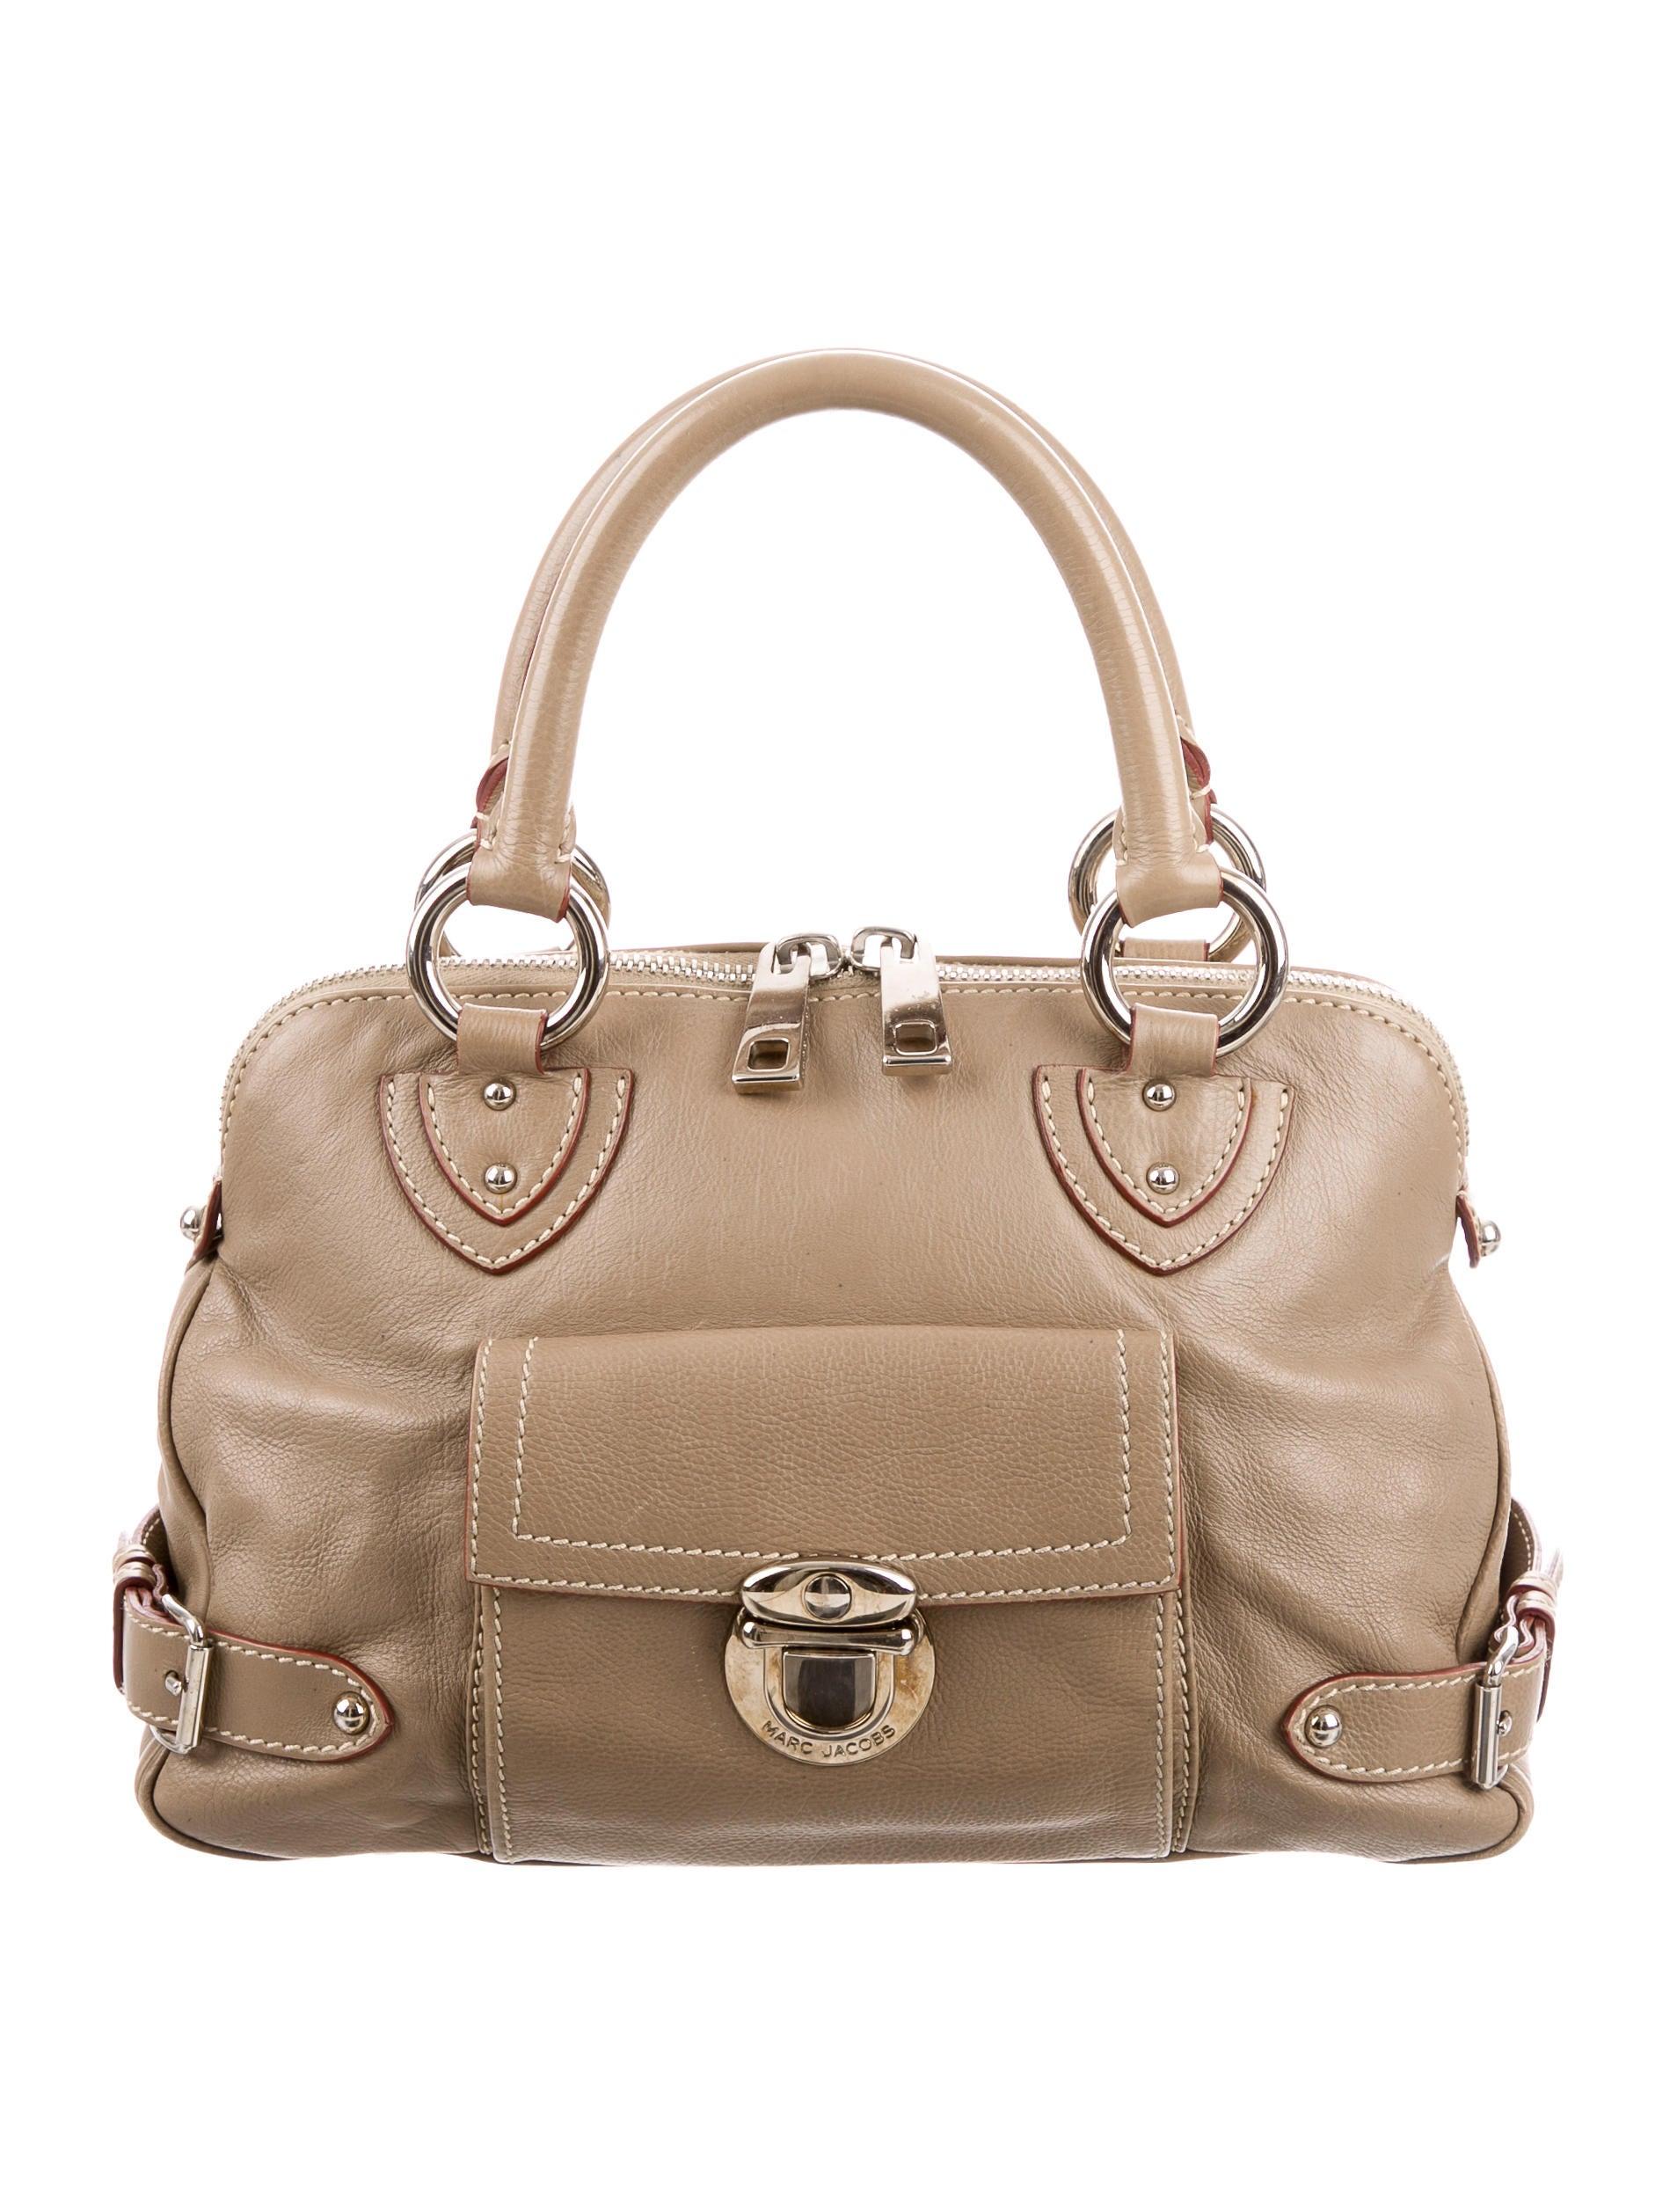 16a948e23e45e Marc Jacobs Leather Shoulder Bag - Handbags - MAR41096